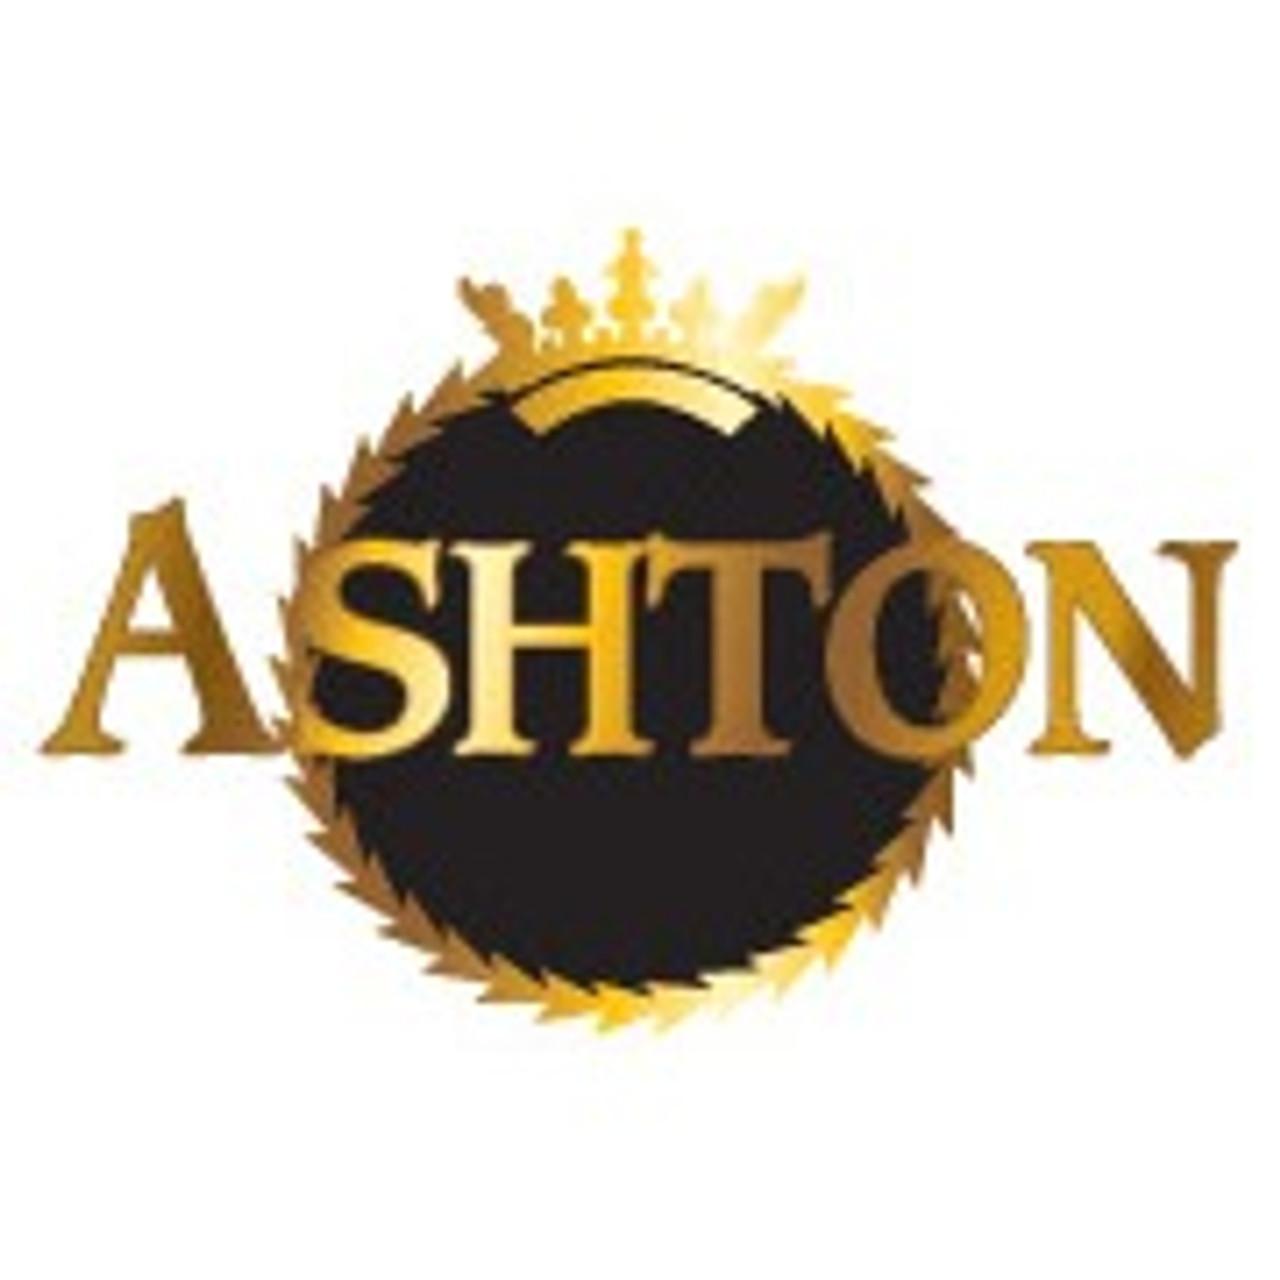 Ashton Half Corona Cigars - 4 1/8 x 37 (10 Packs of 5)